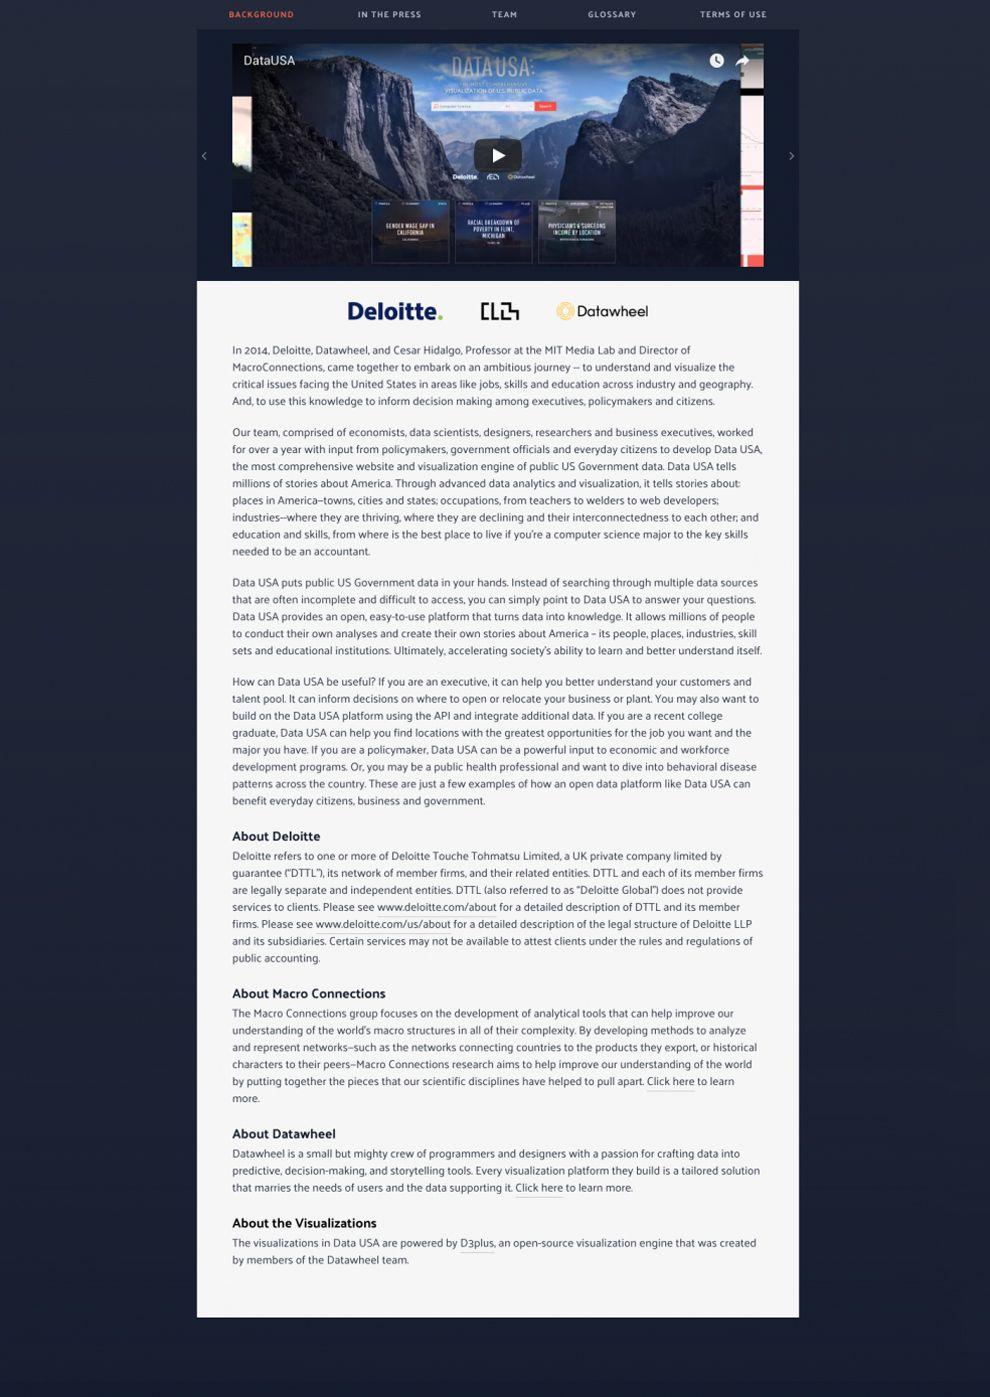 Data USA Great Website Design